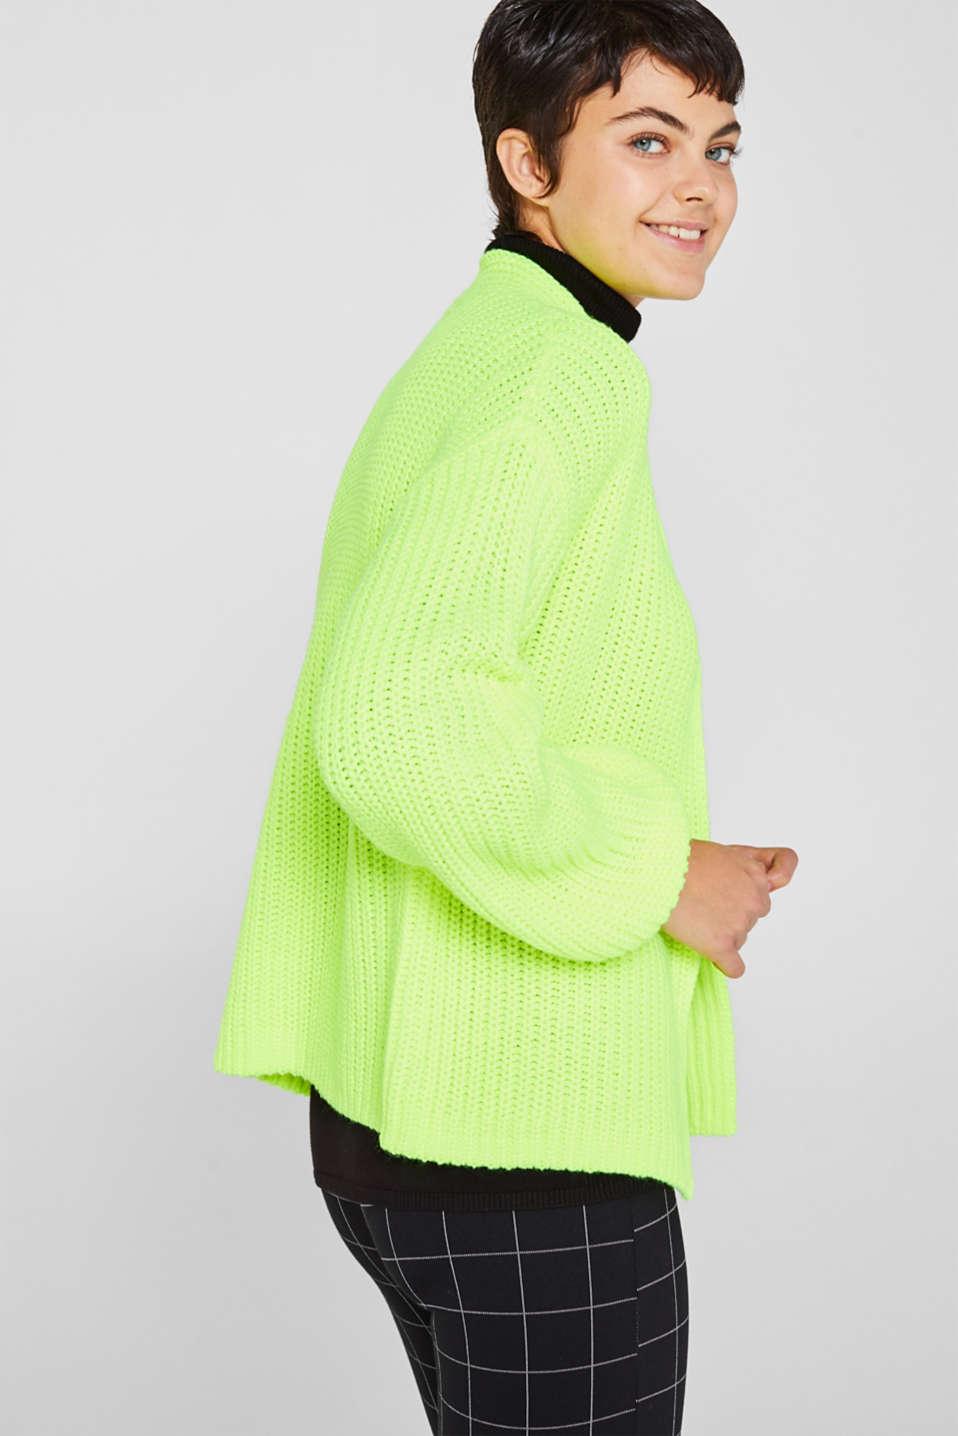 Open rib knit NEON cardigan, PASTEL YELLOW, detail image number 4